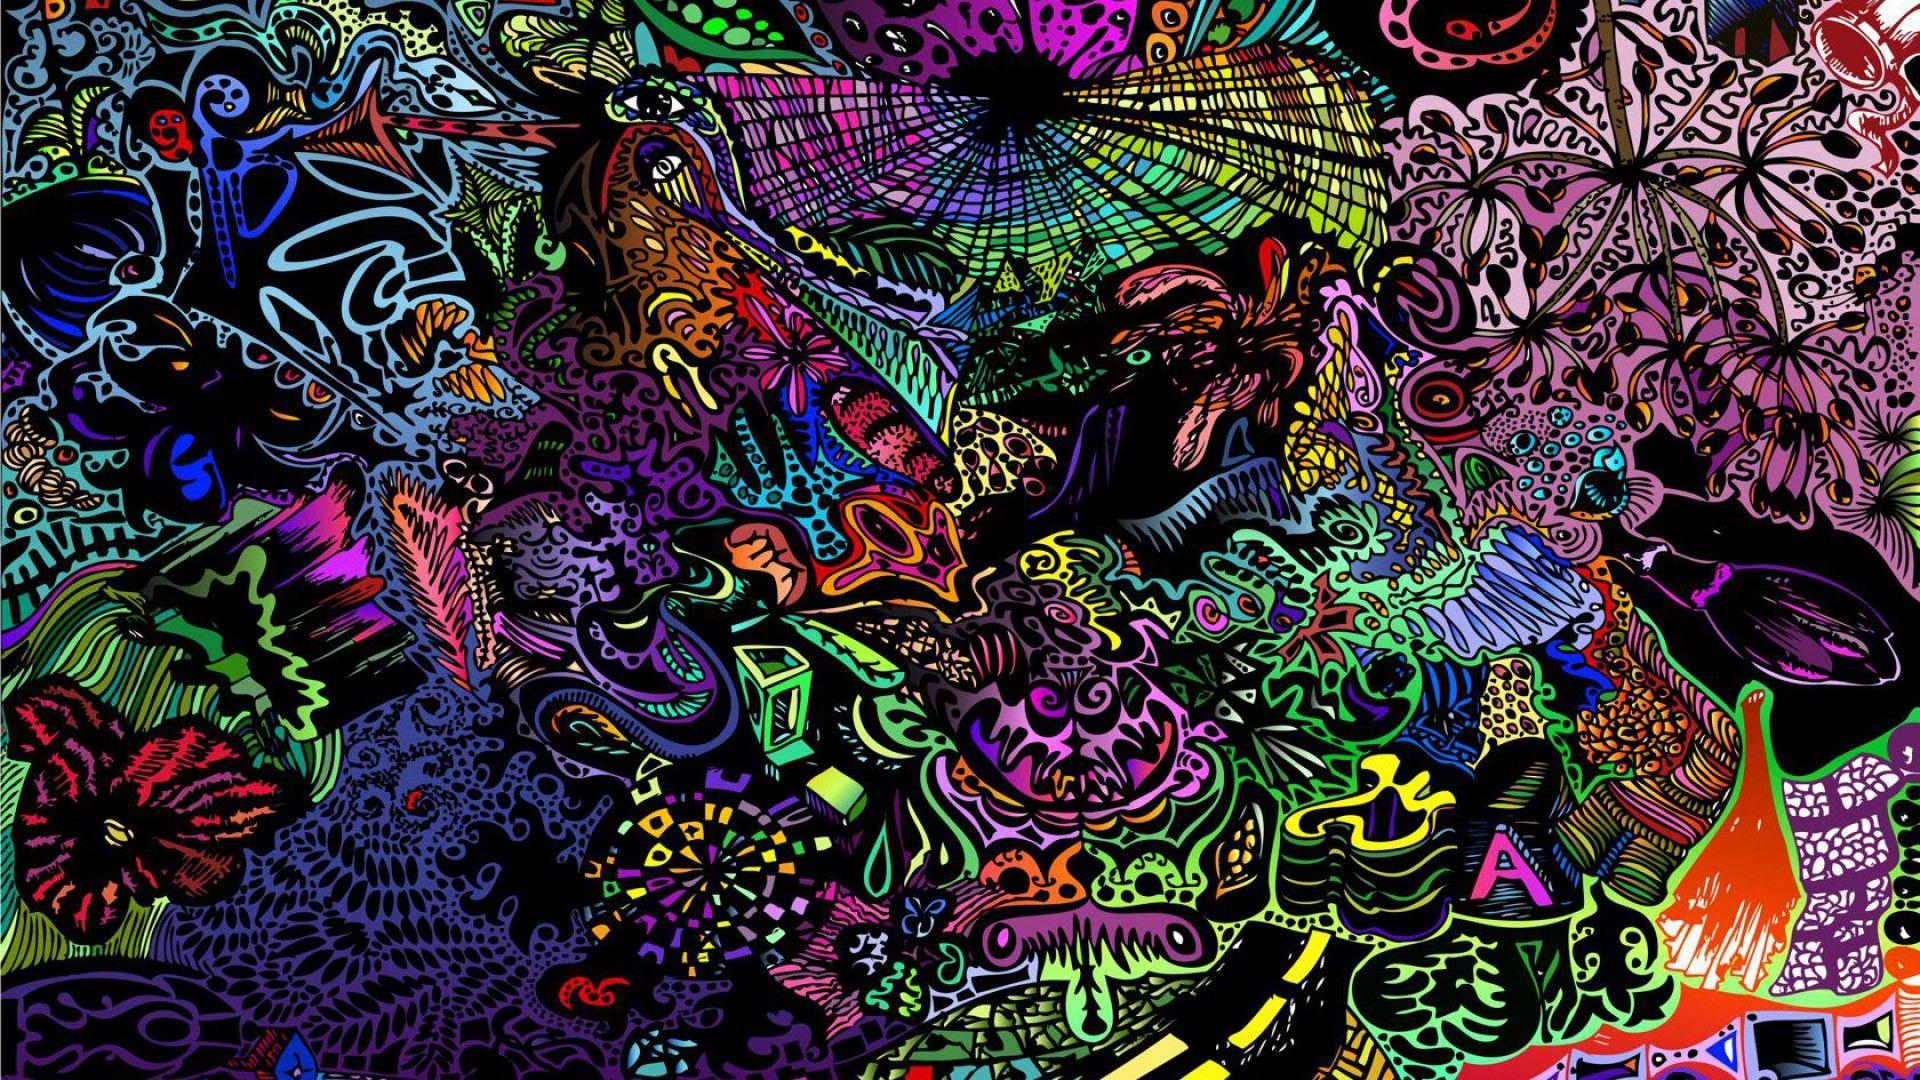 Triipy clipart hd wallpaper Hd Trippy Wallpaper Space Pinterest